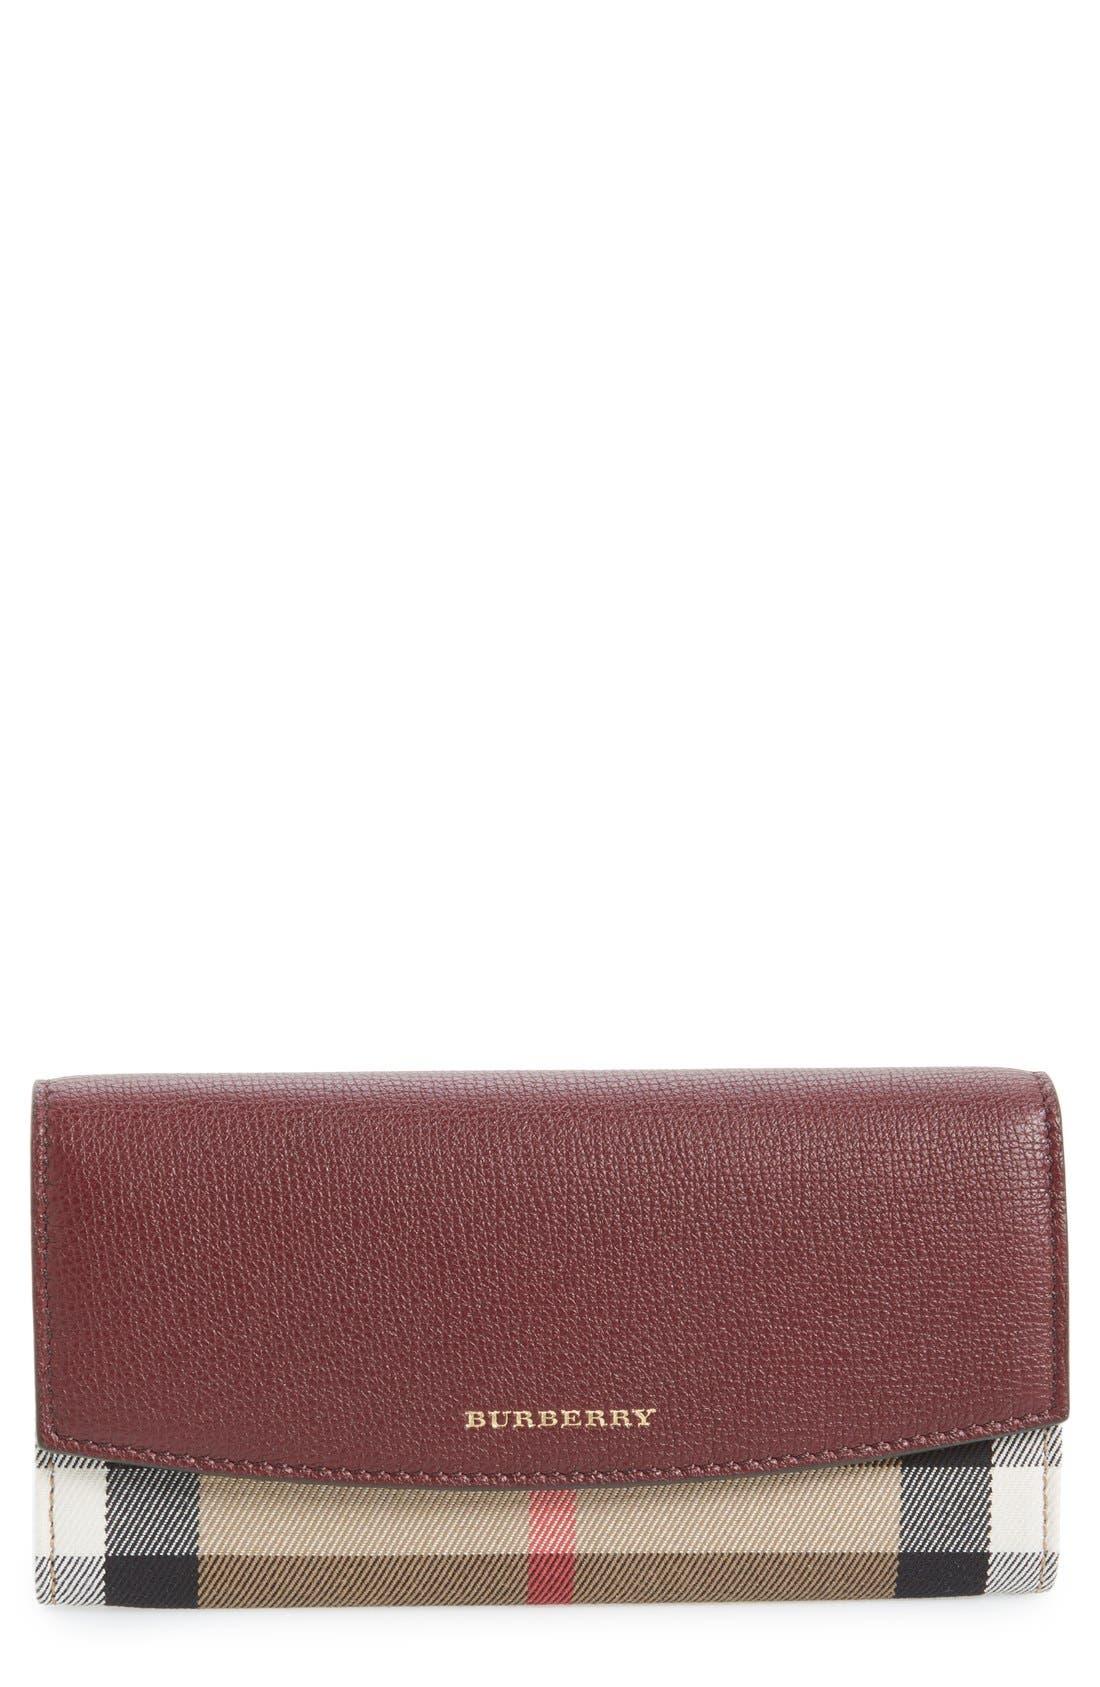 'Porter - Check' Continental Wallet,                         Main,                         color,